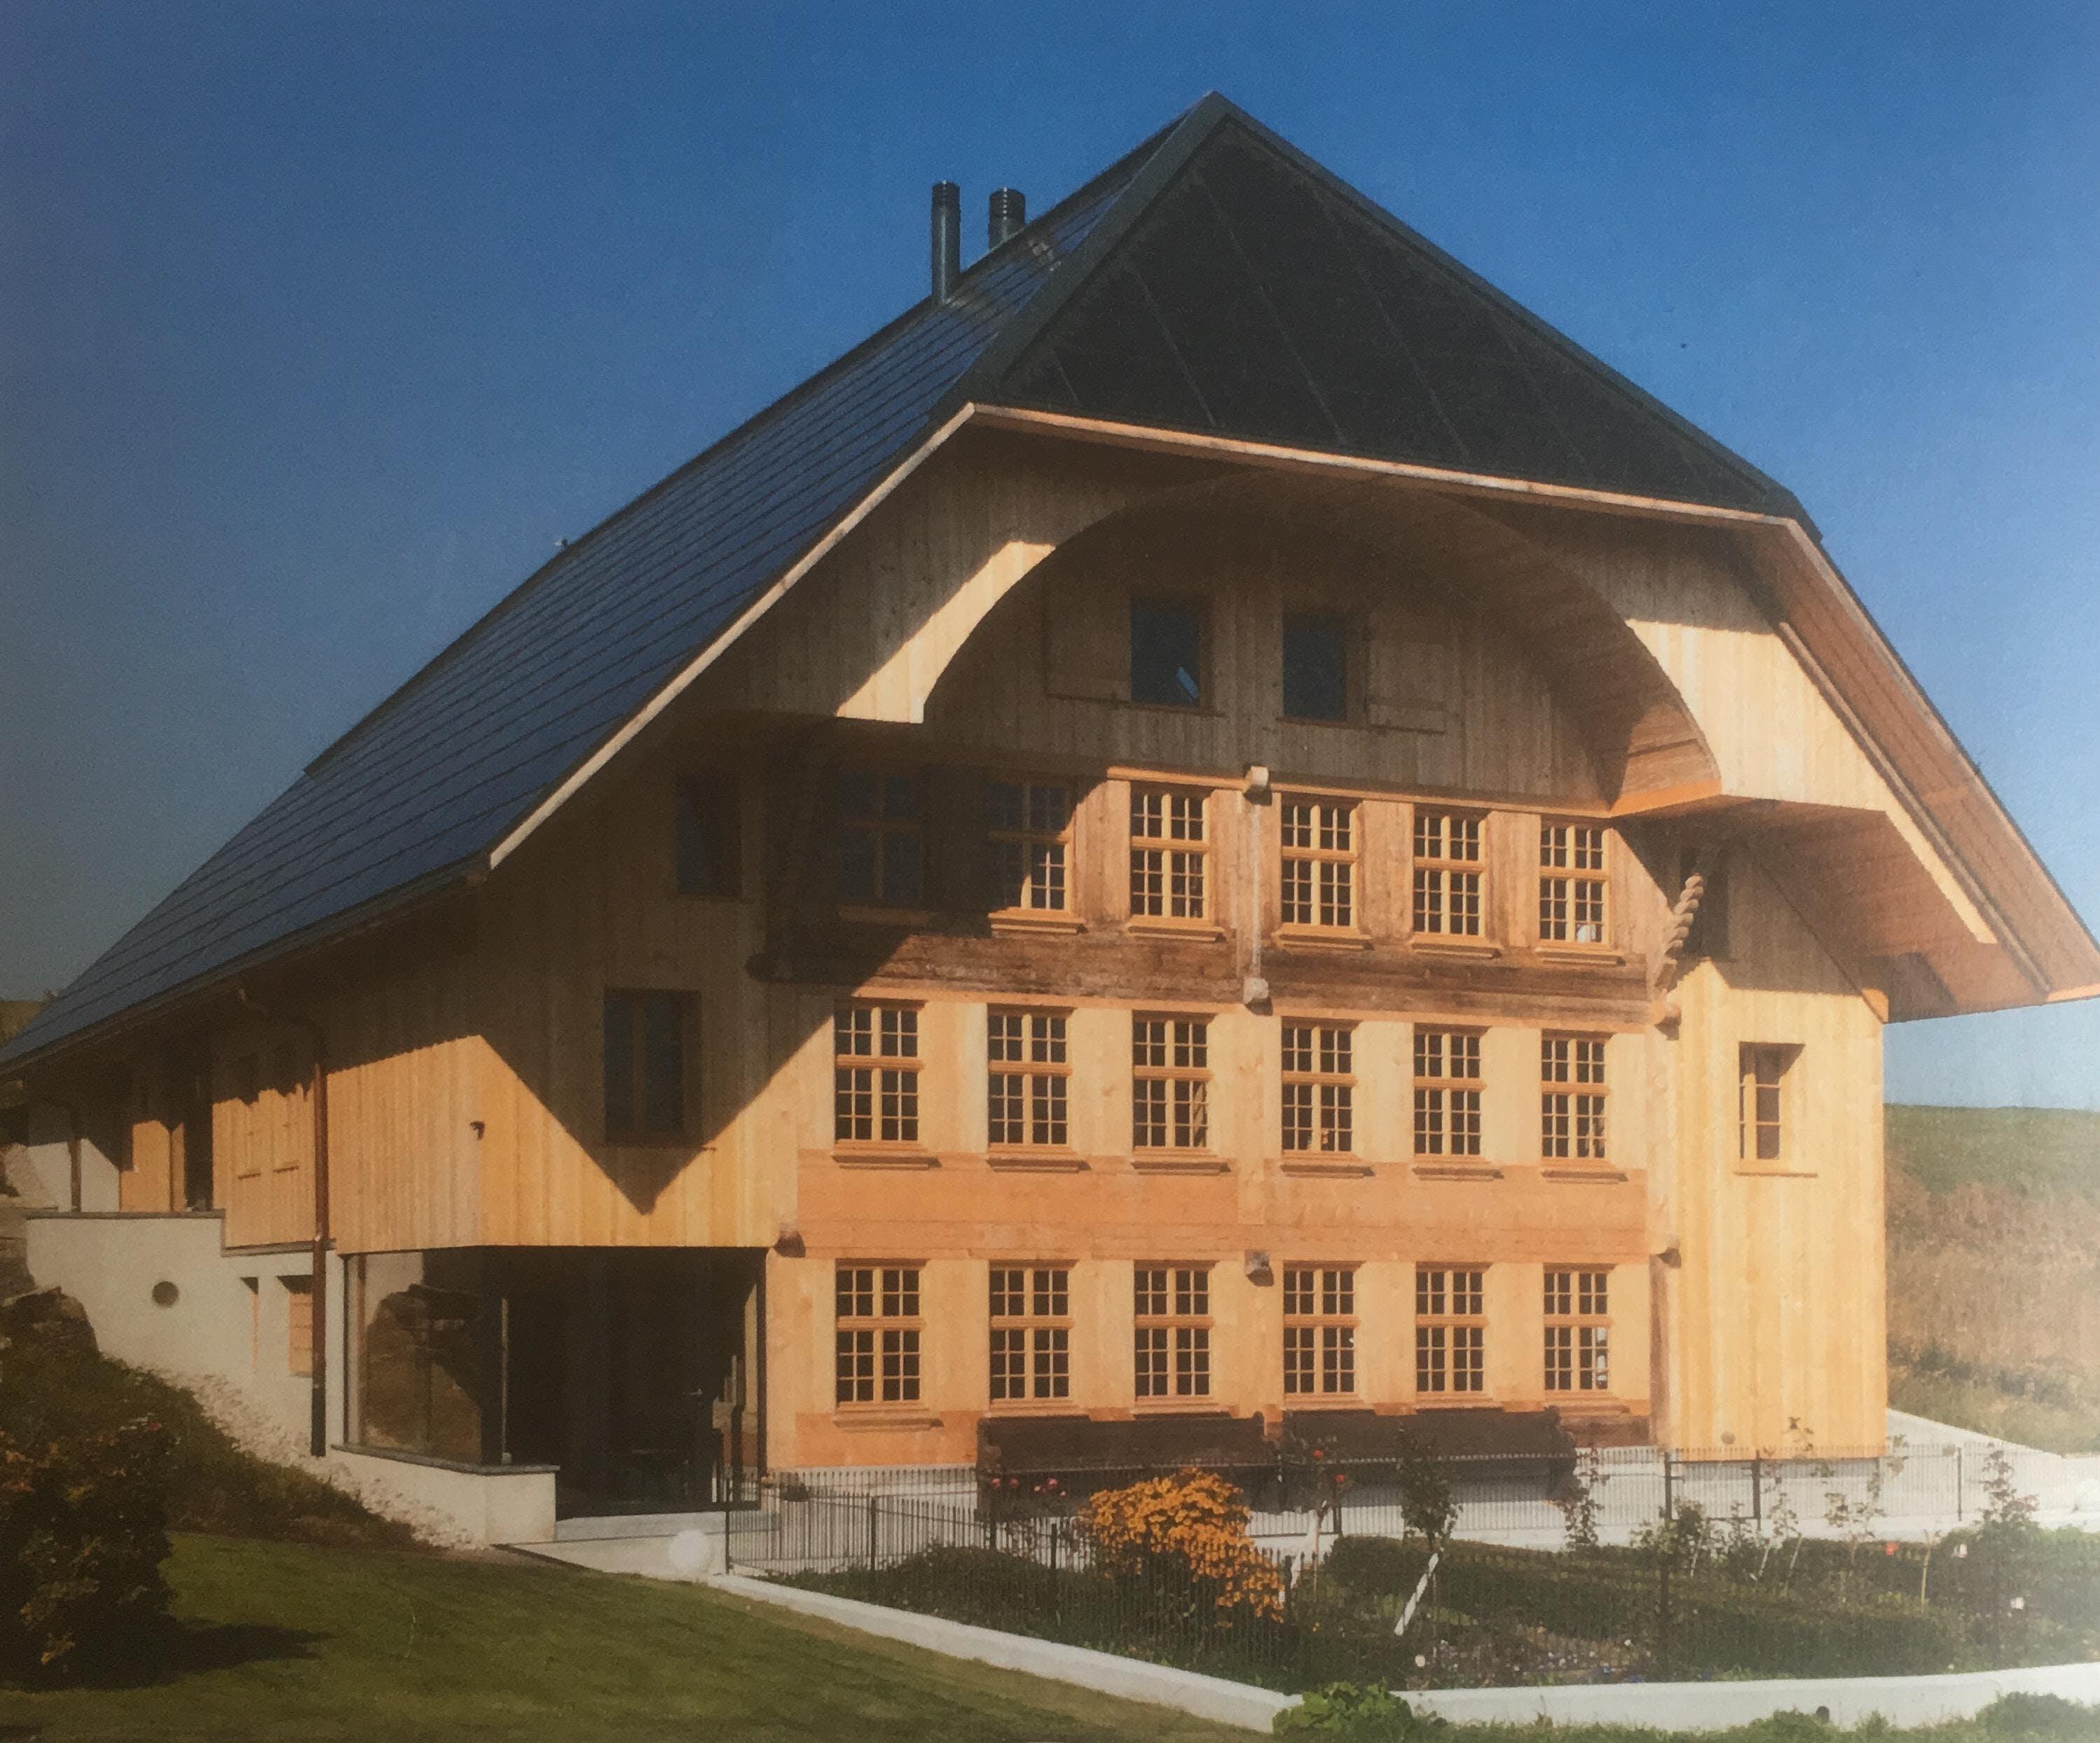 Glaserhaus / Doktorhaus